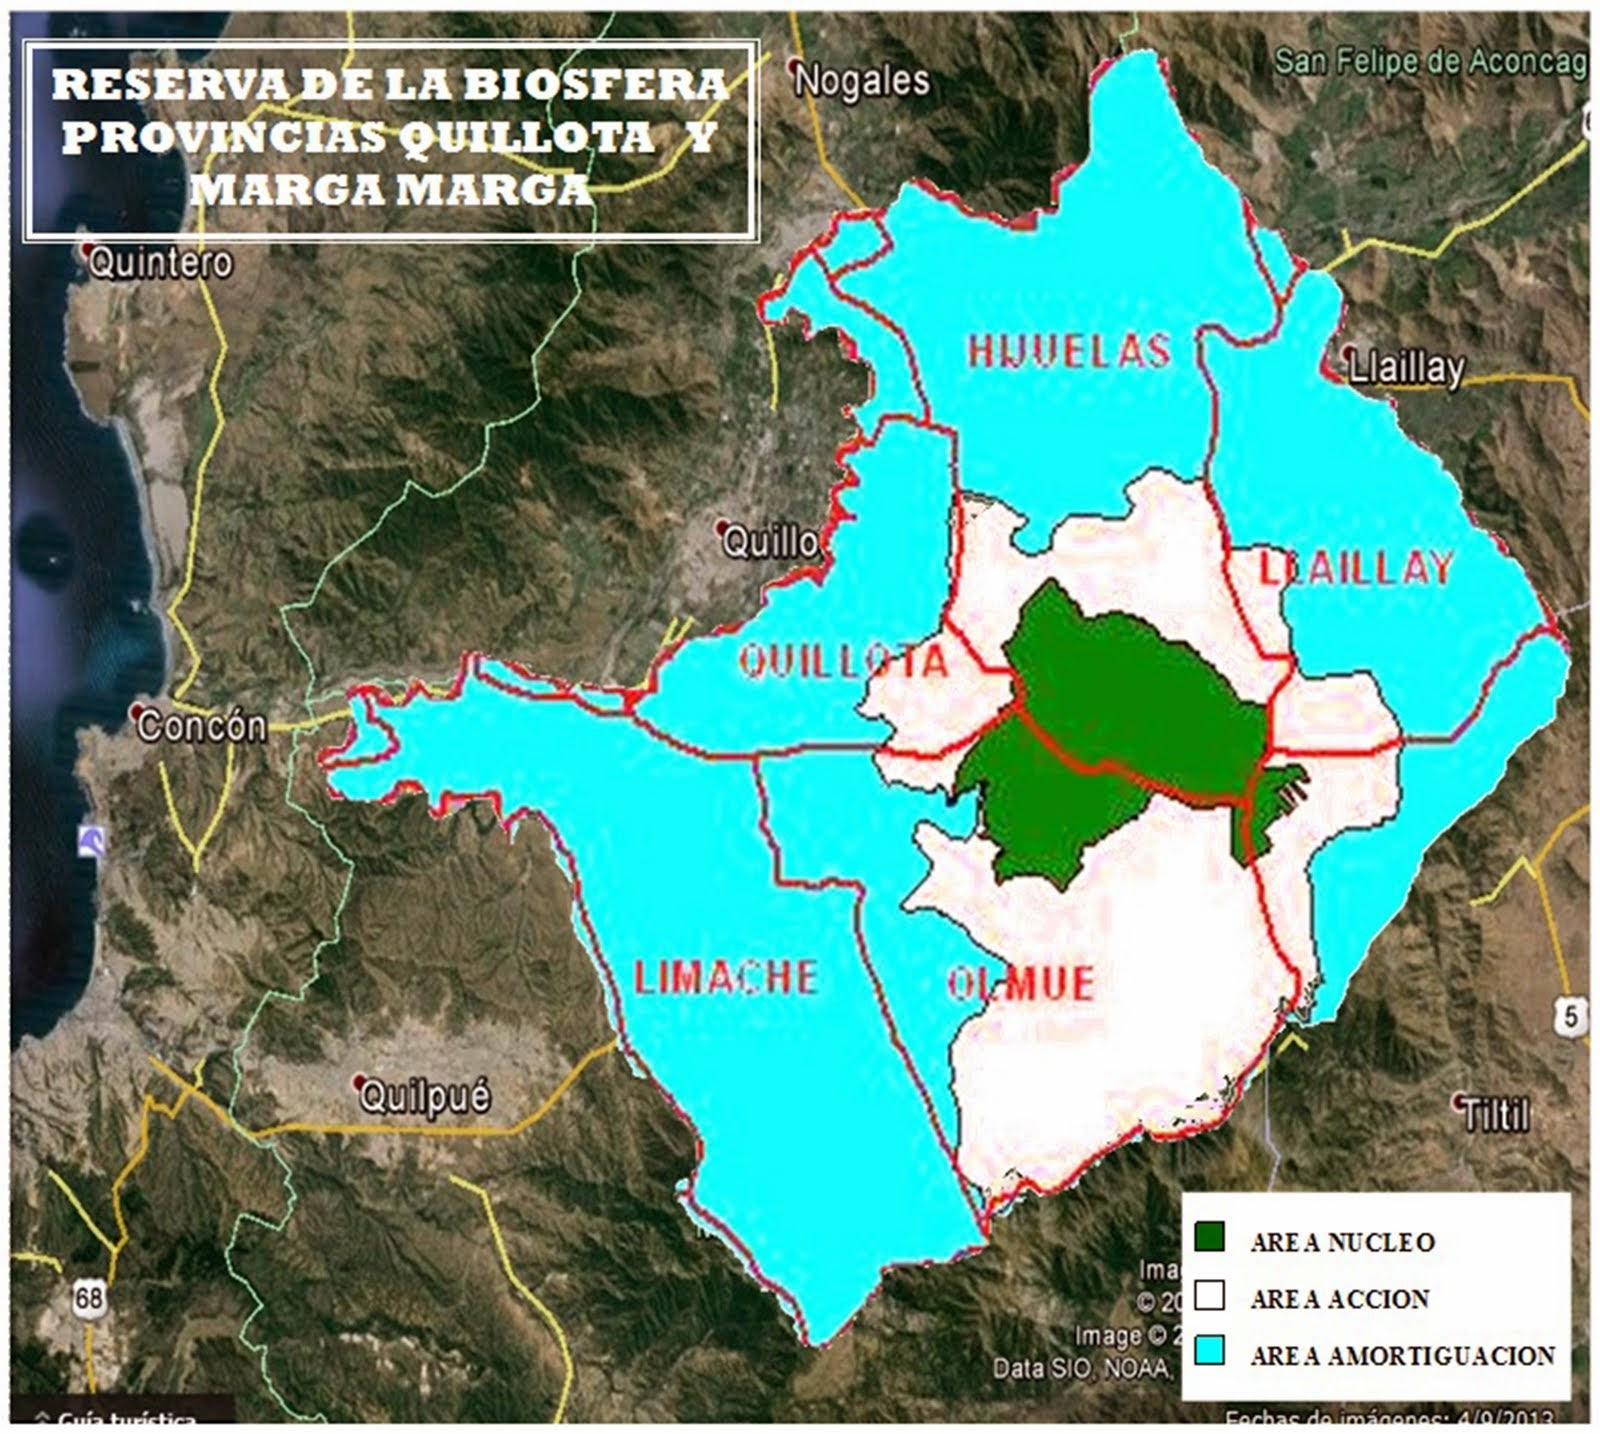 Mapa de la Reserva